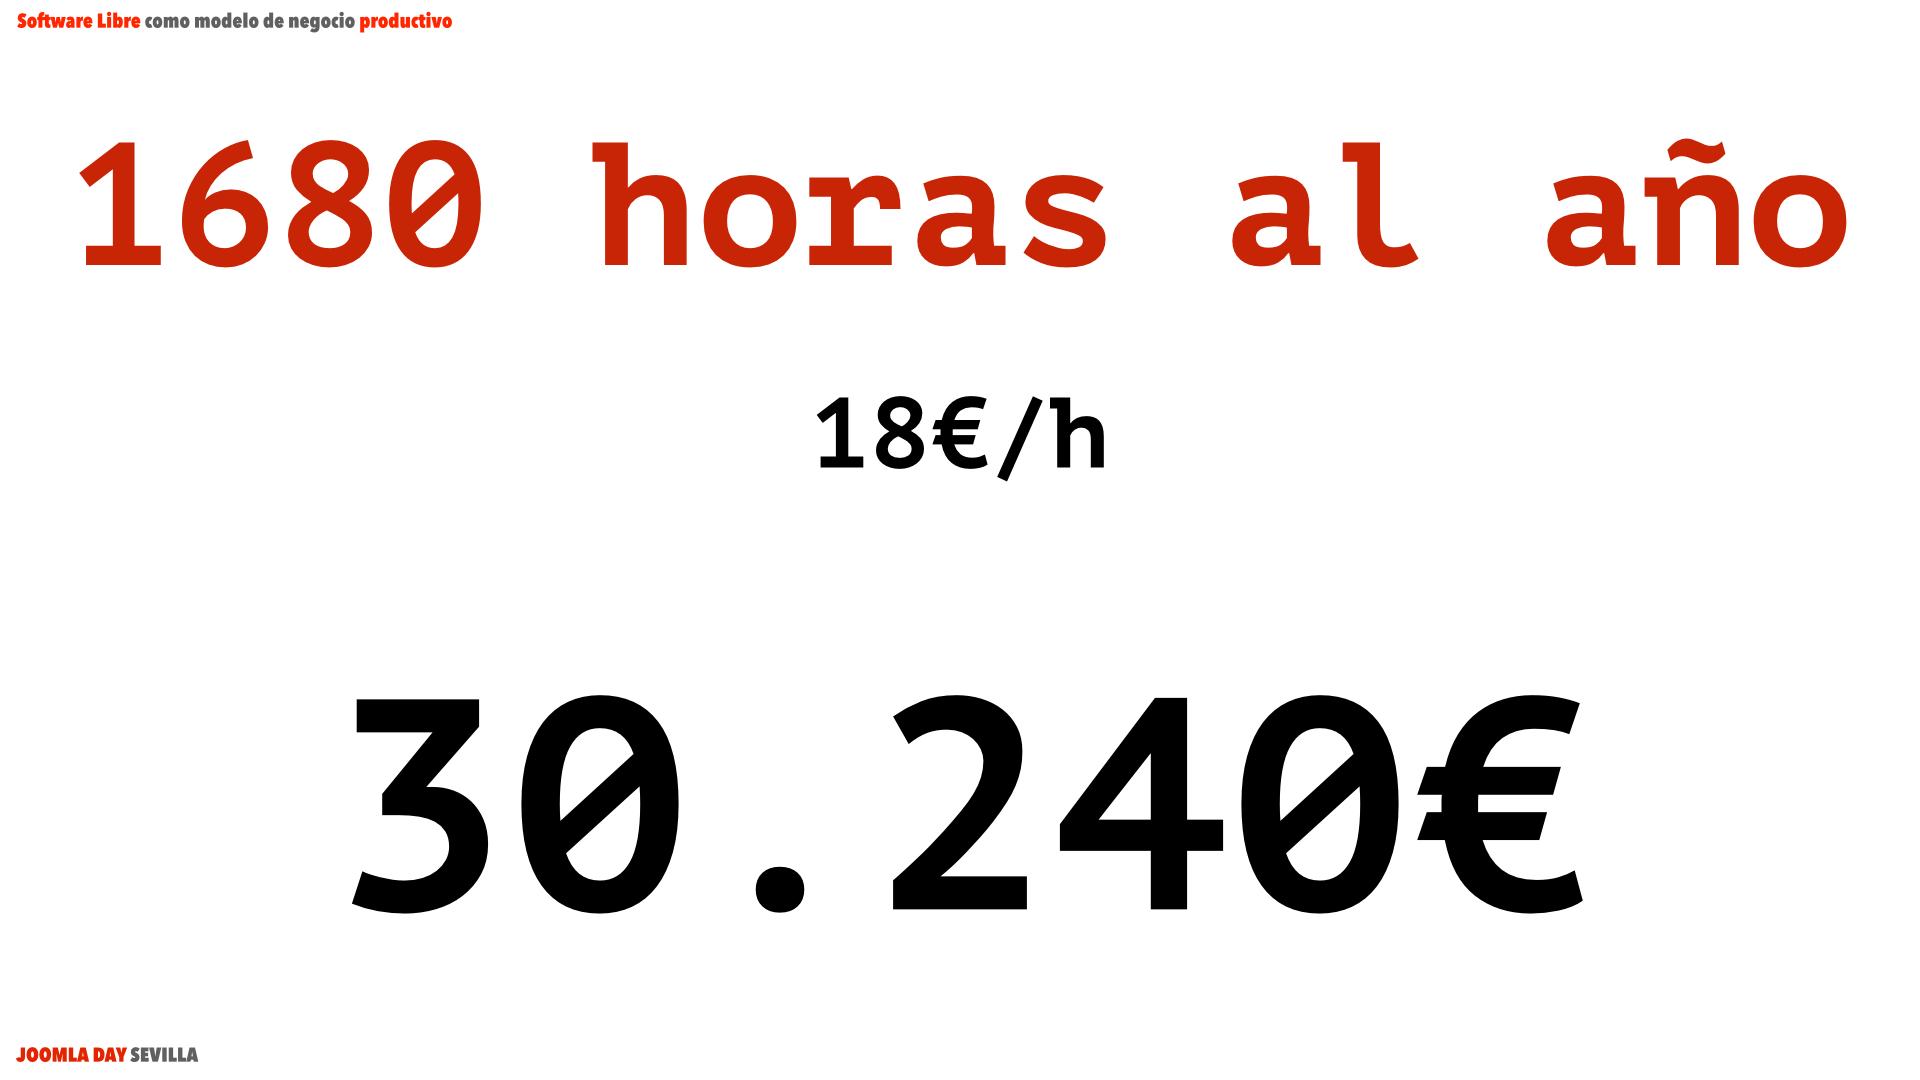 SL.081